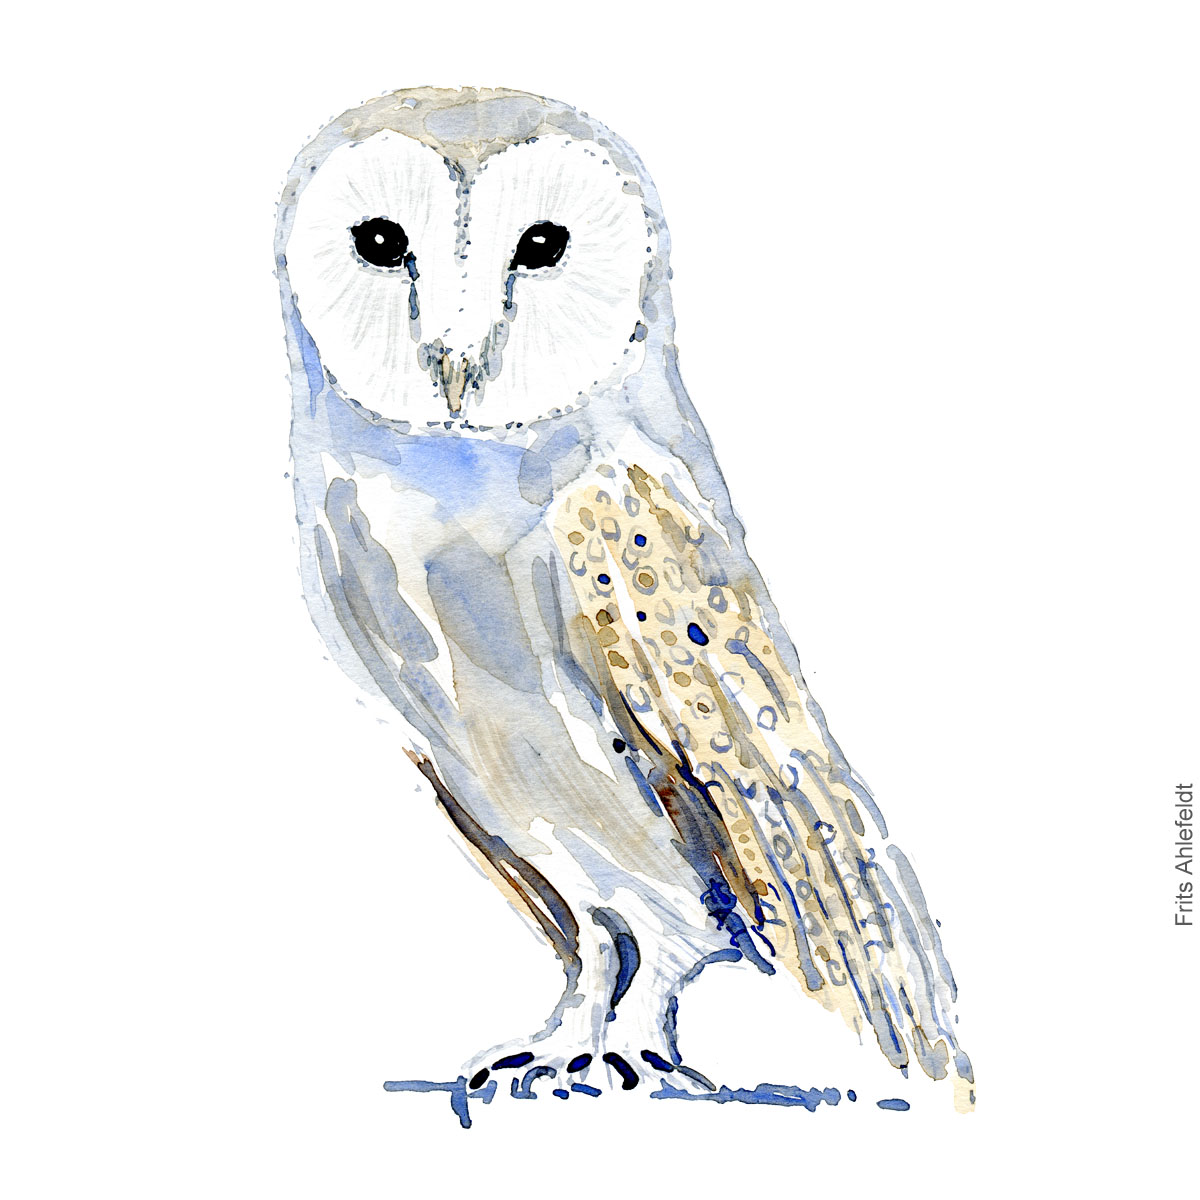 Sloerugle - Barn owl - Bird painting in watercolor by Frits Ahlefeldt - Fugle akvarel